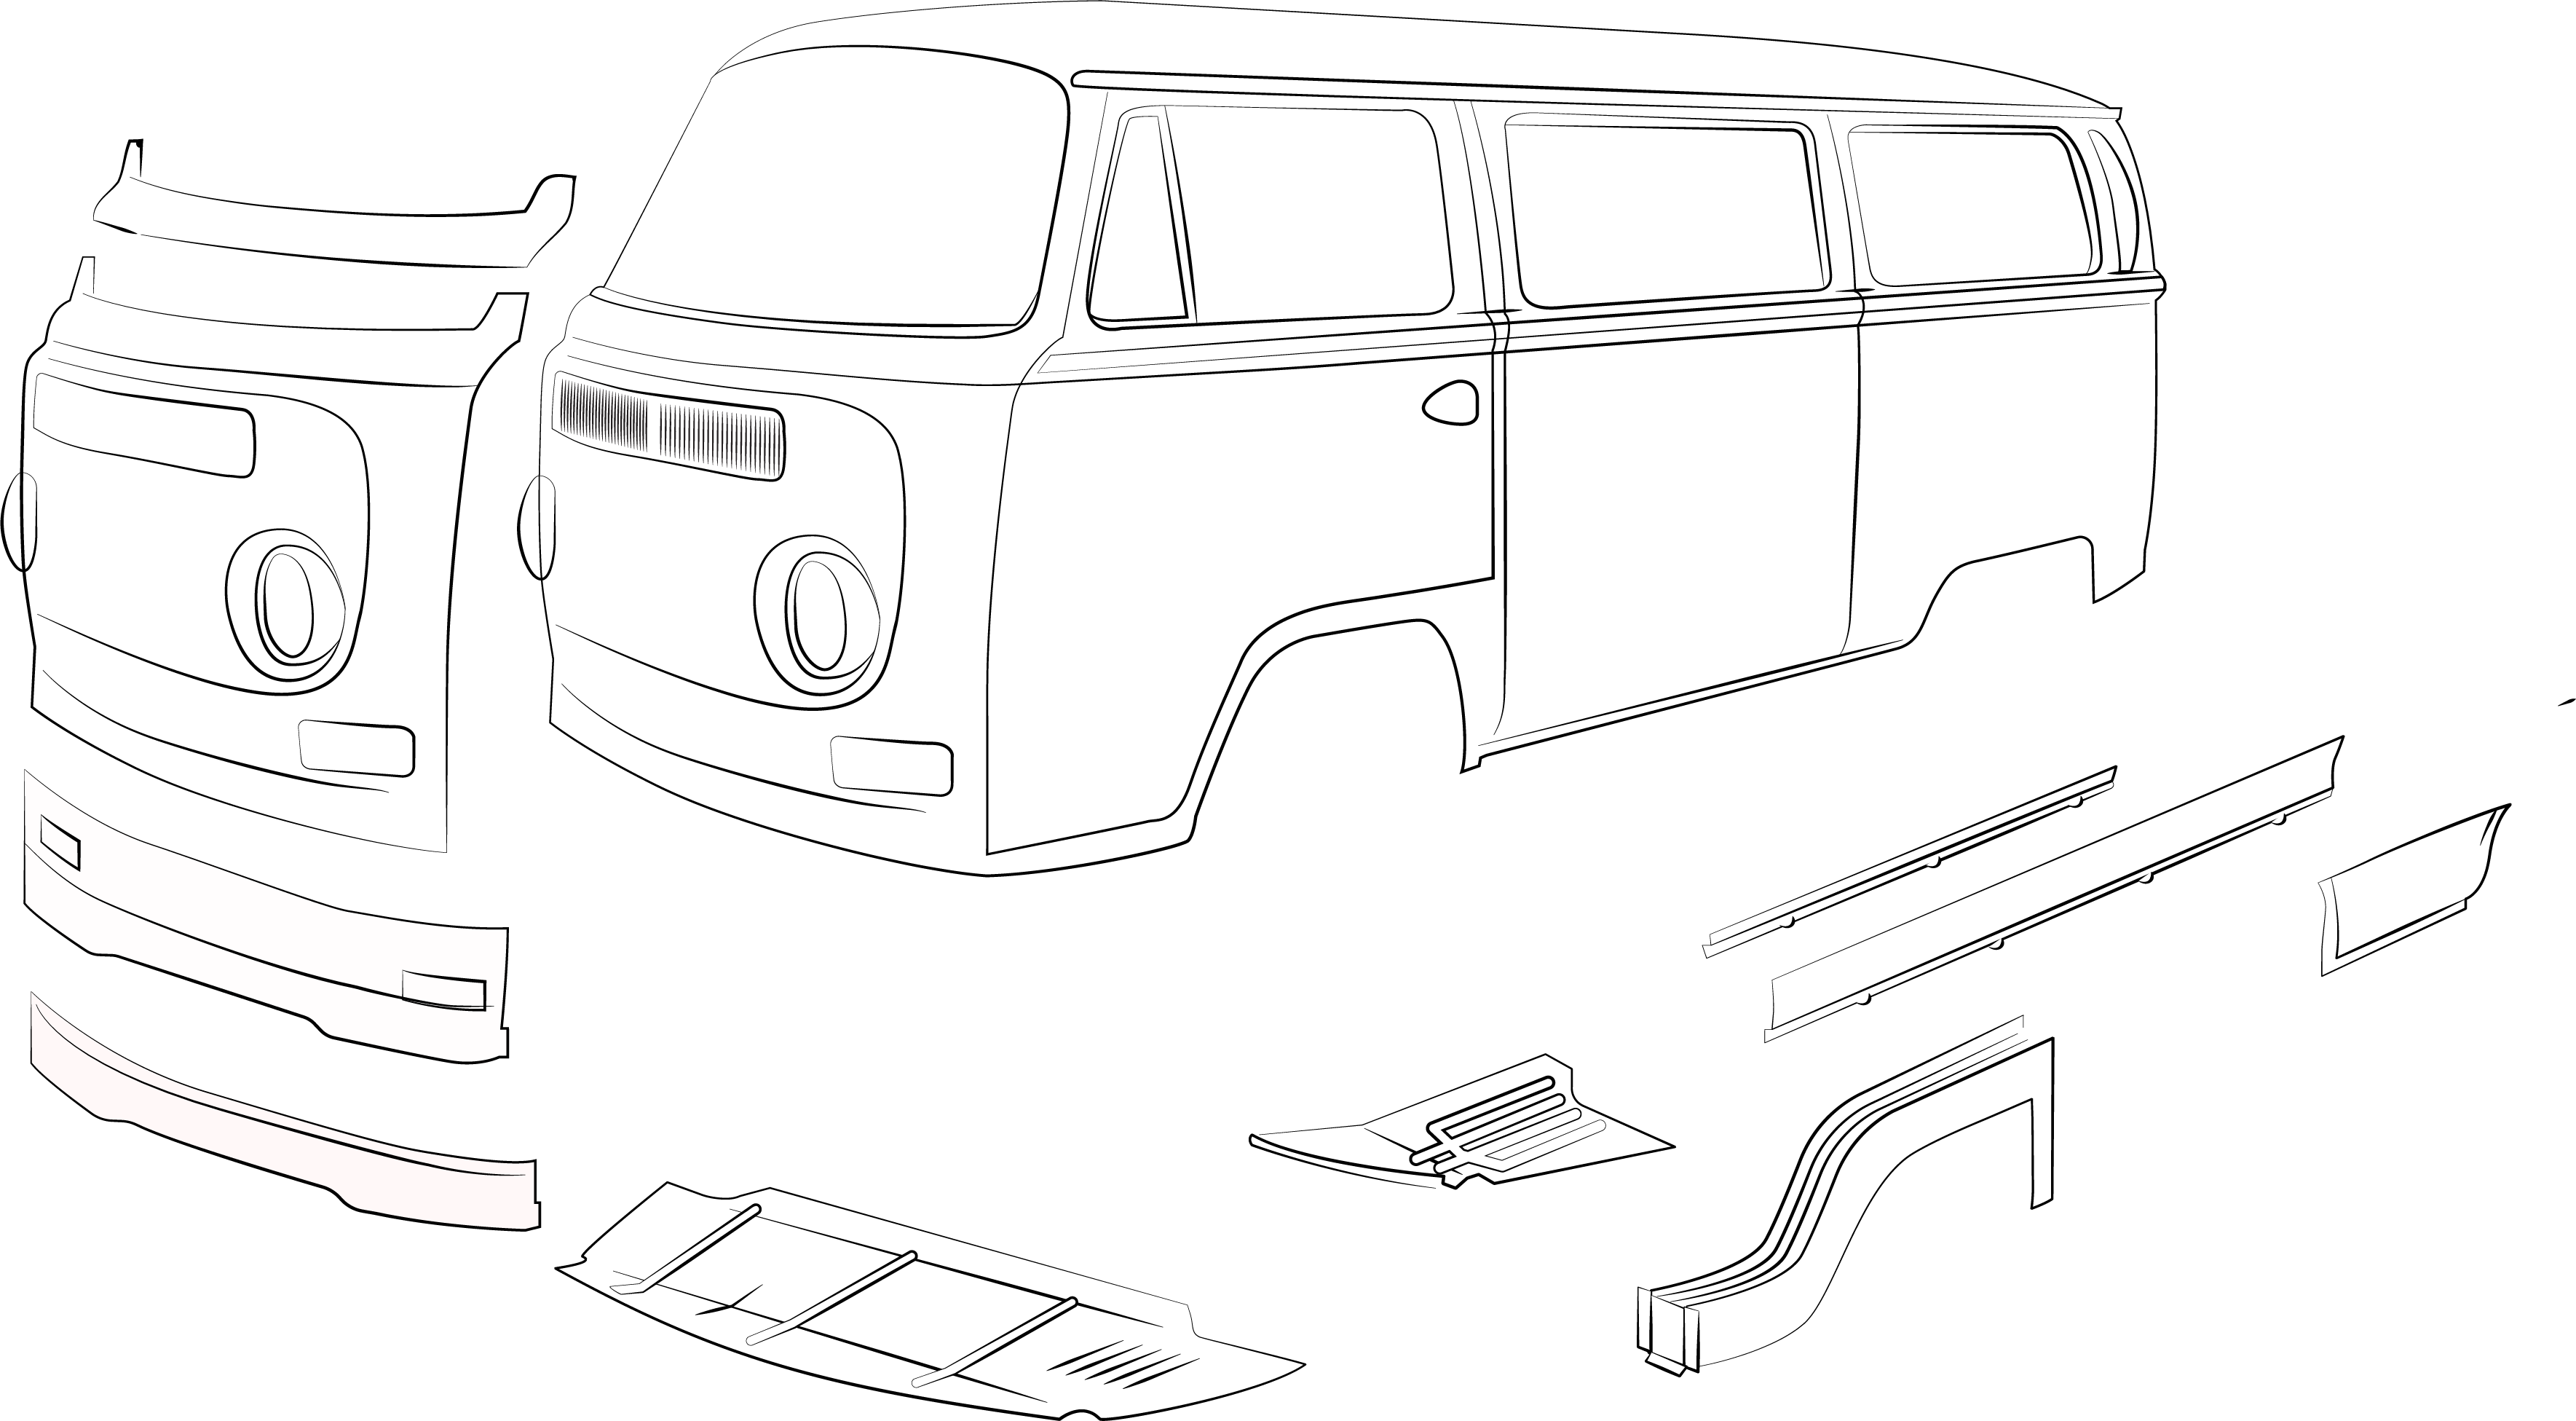 Download Lorem Ipsum Sketch Png Image With No Background Pngkey Com